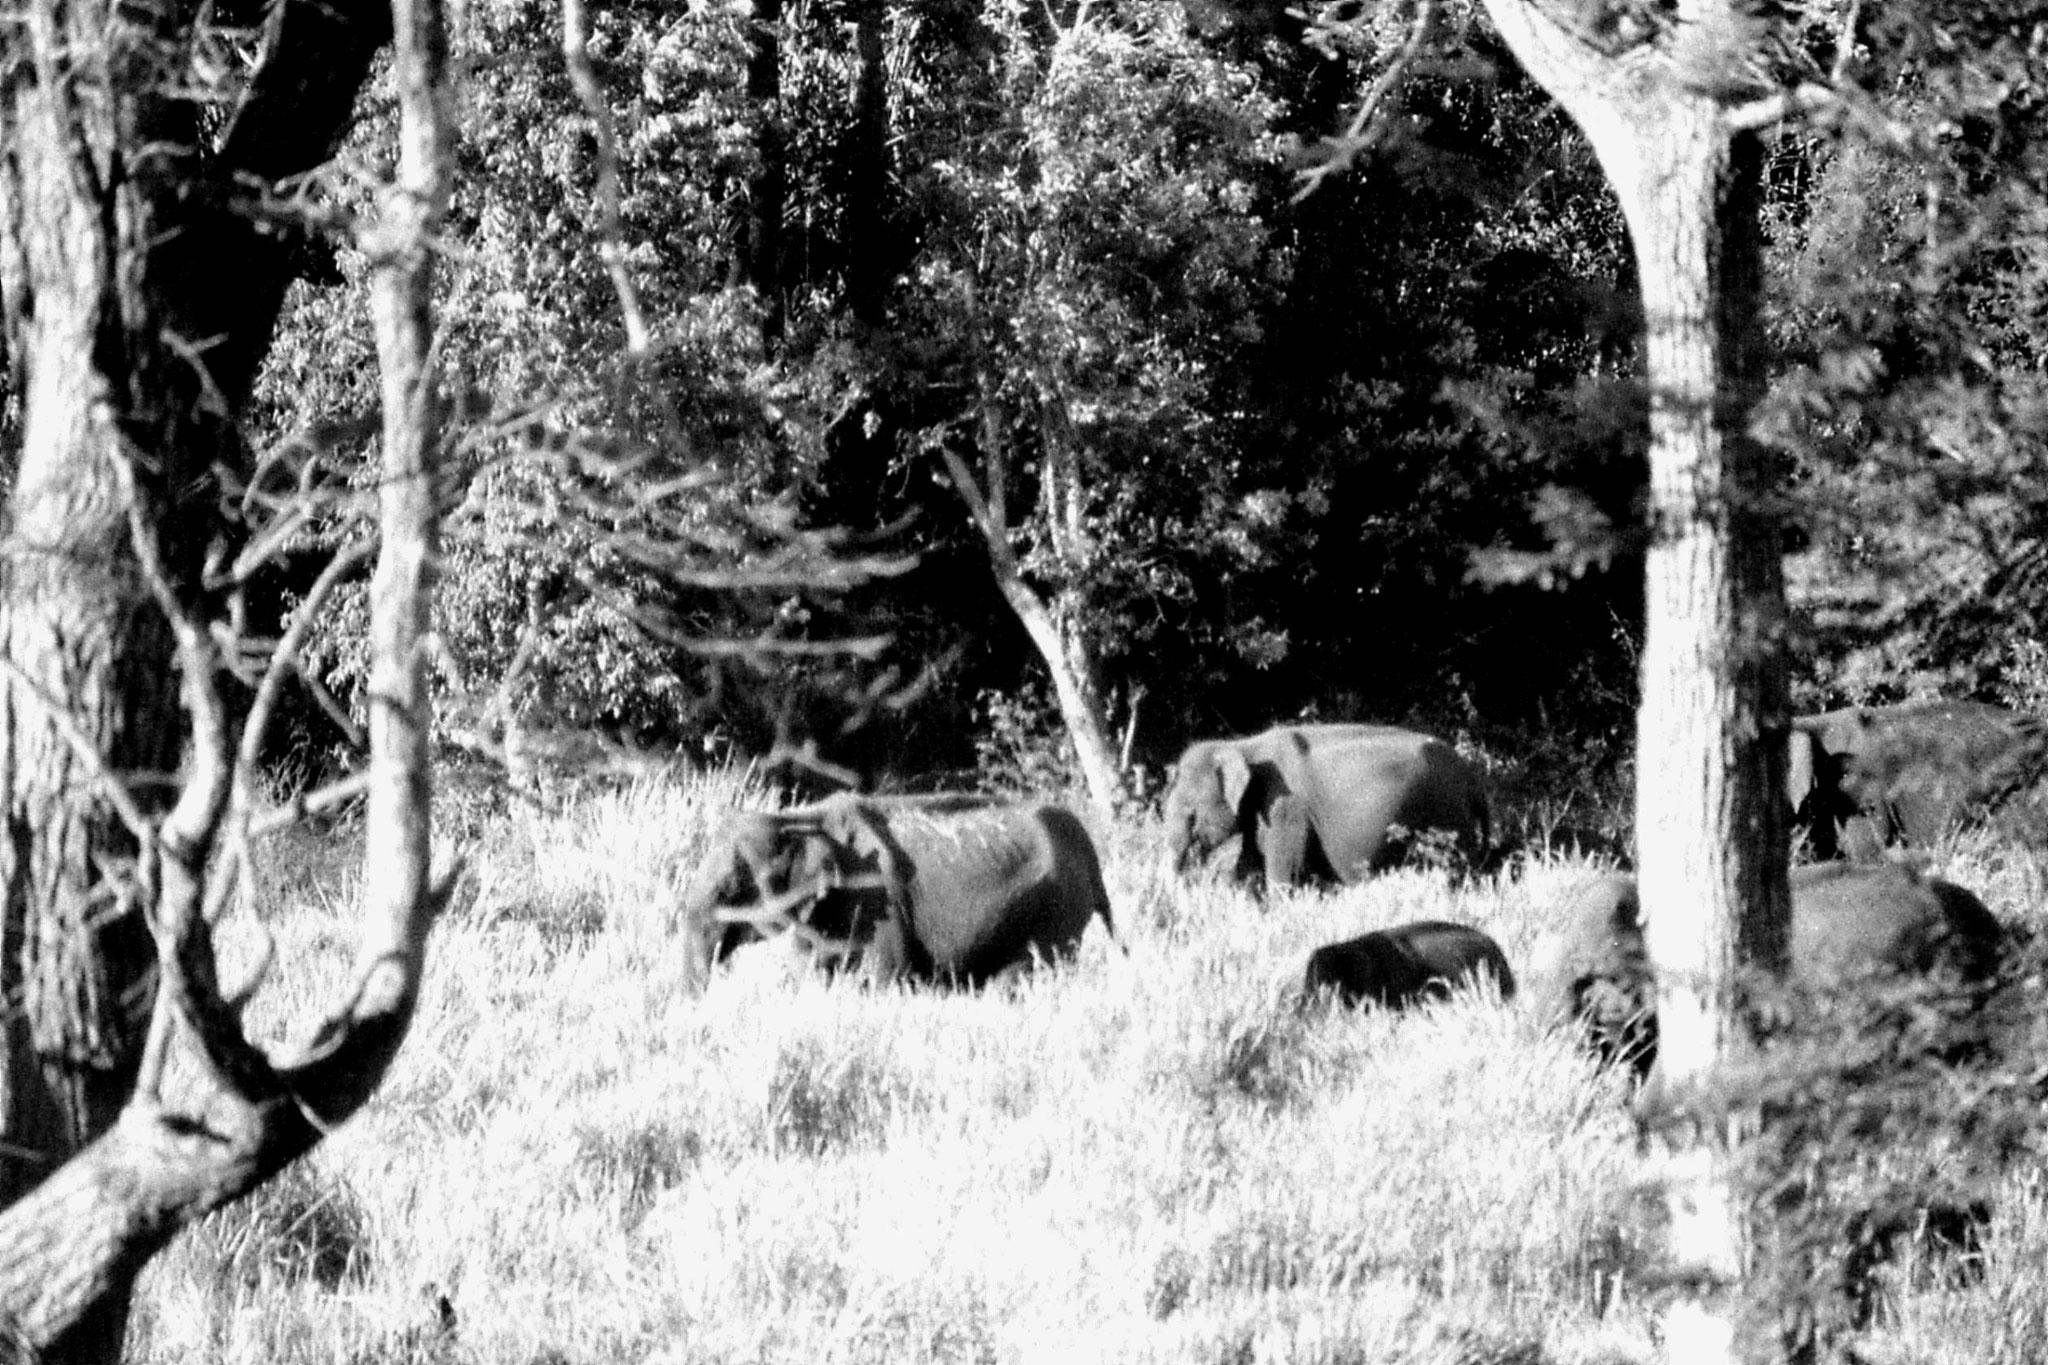 9/3/1990: 19: Nagarahole